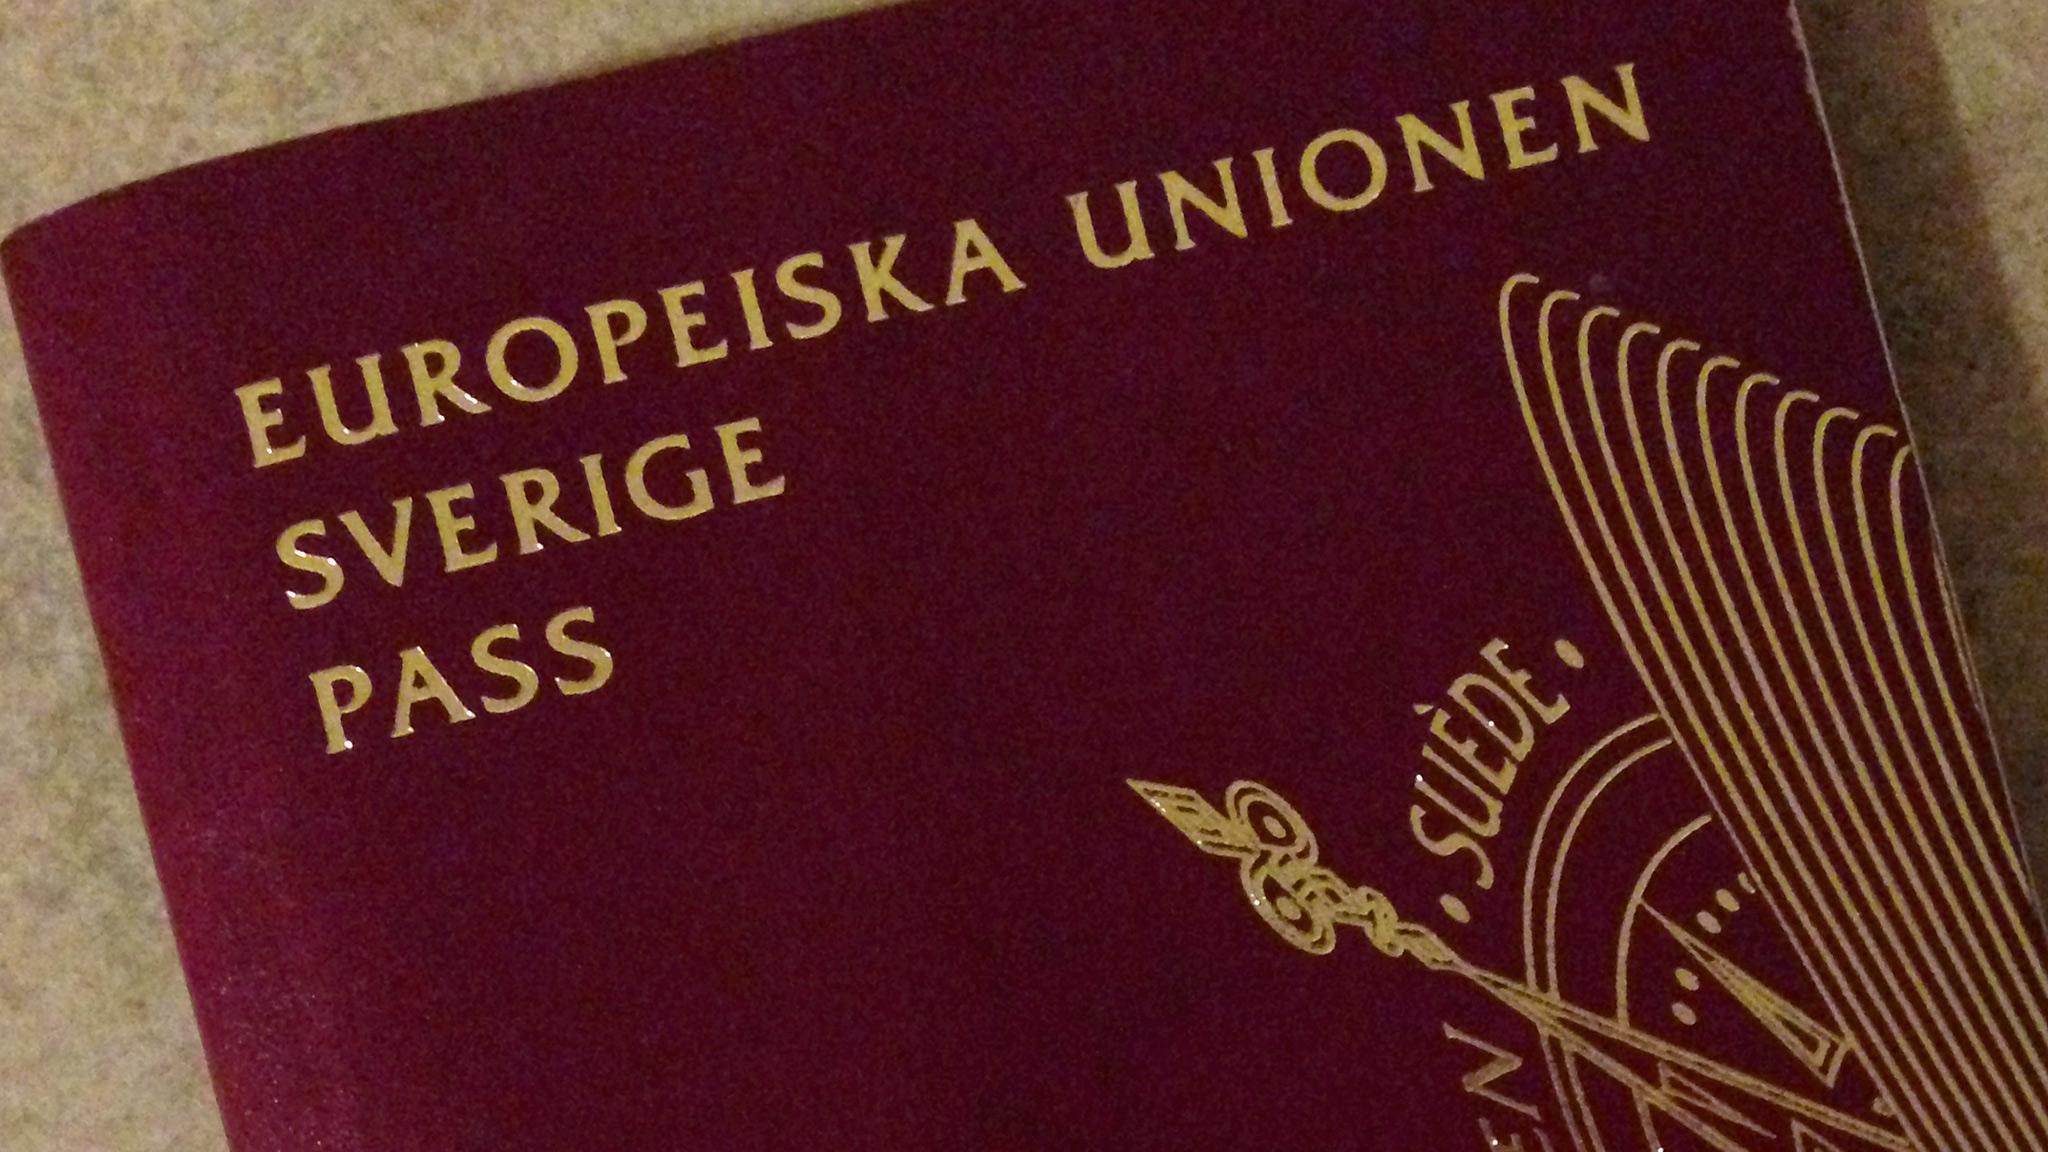 Travel to Russia - Russian passport